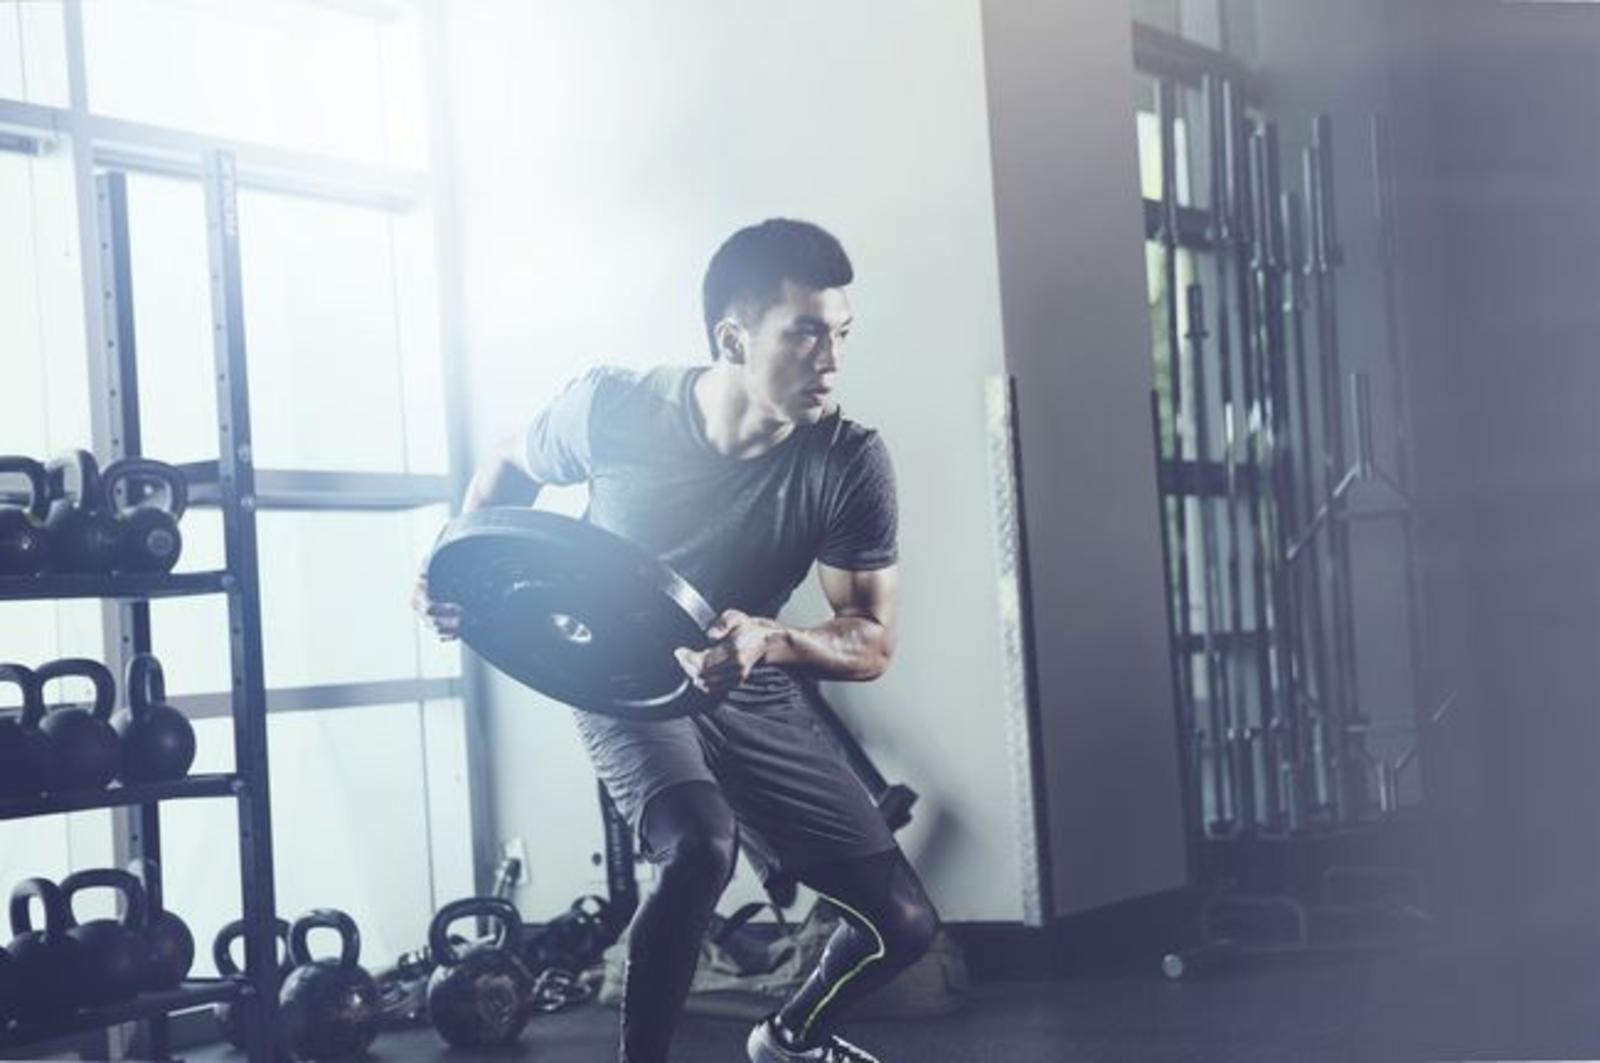 Nike Free Trainer 1.0 Brings Barefoot Feel Training